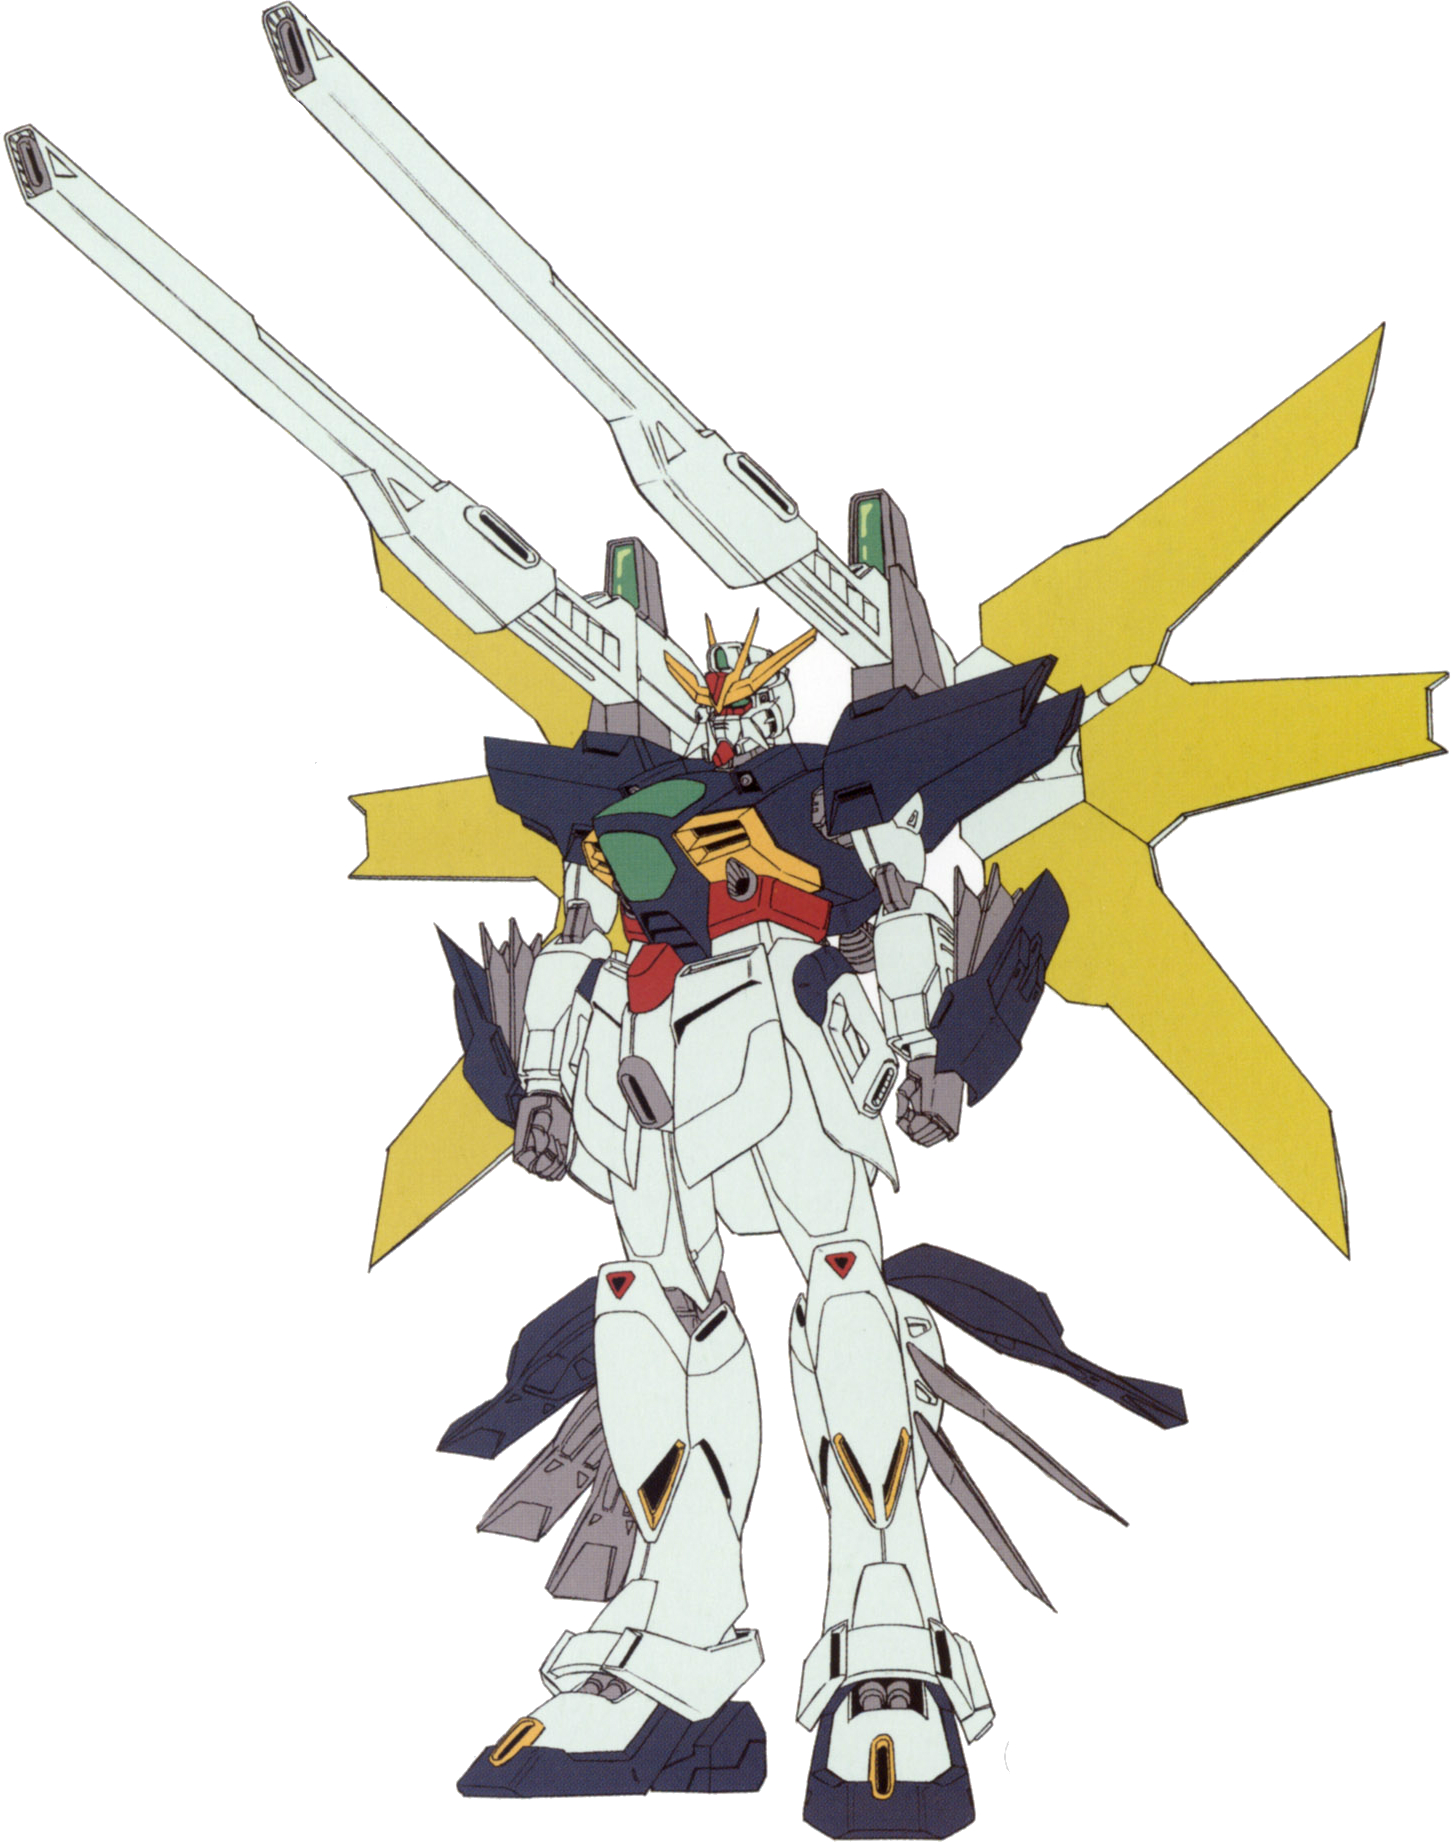 GX-9901-DX Gundam Double X - Gundam Wiki